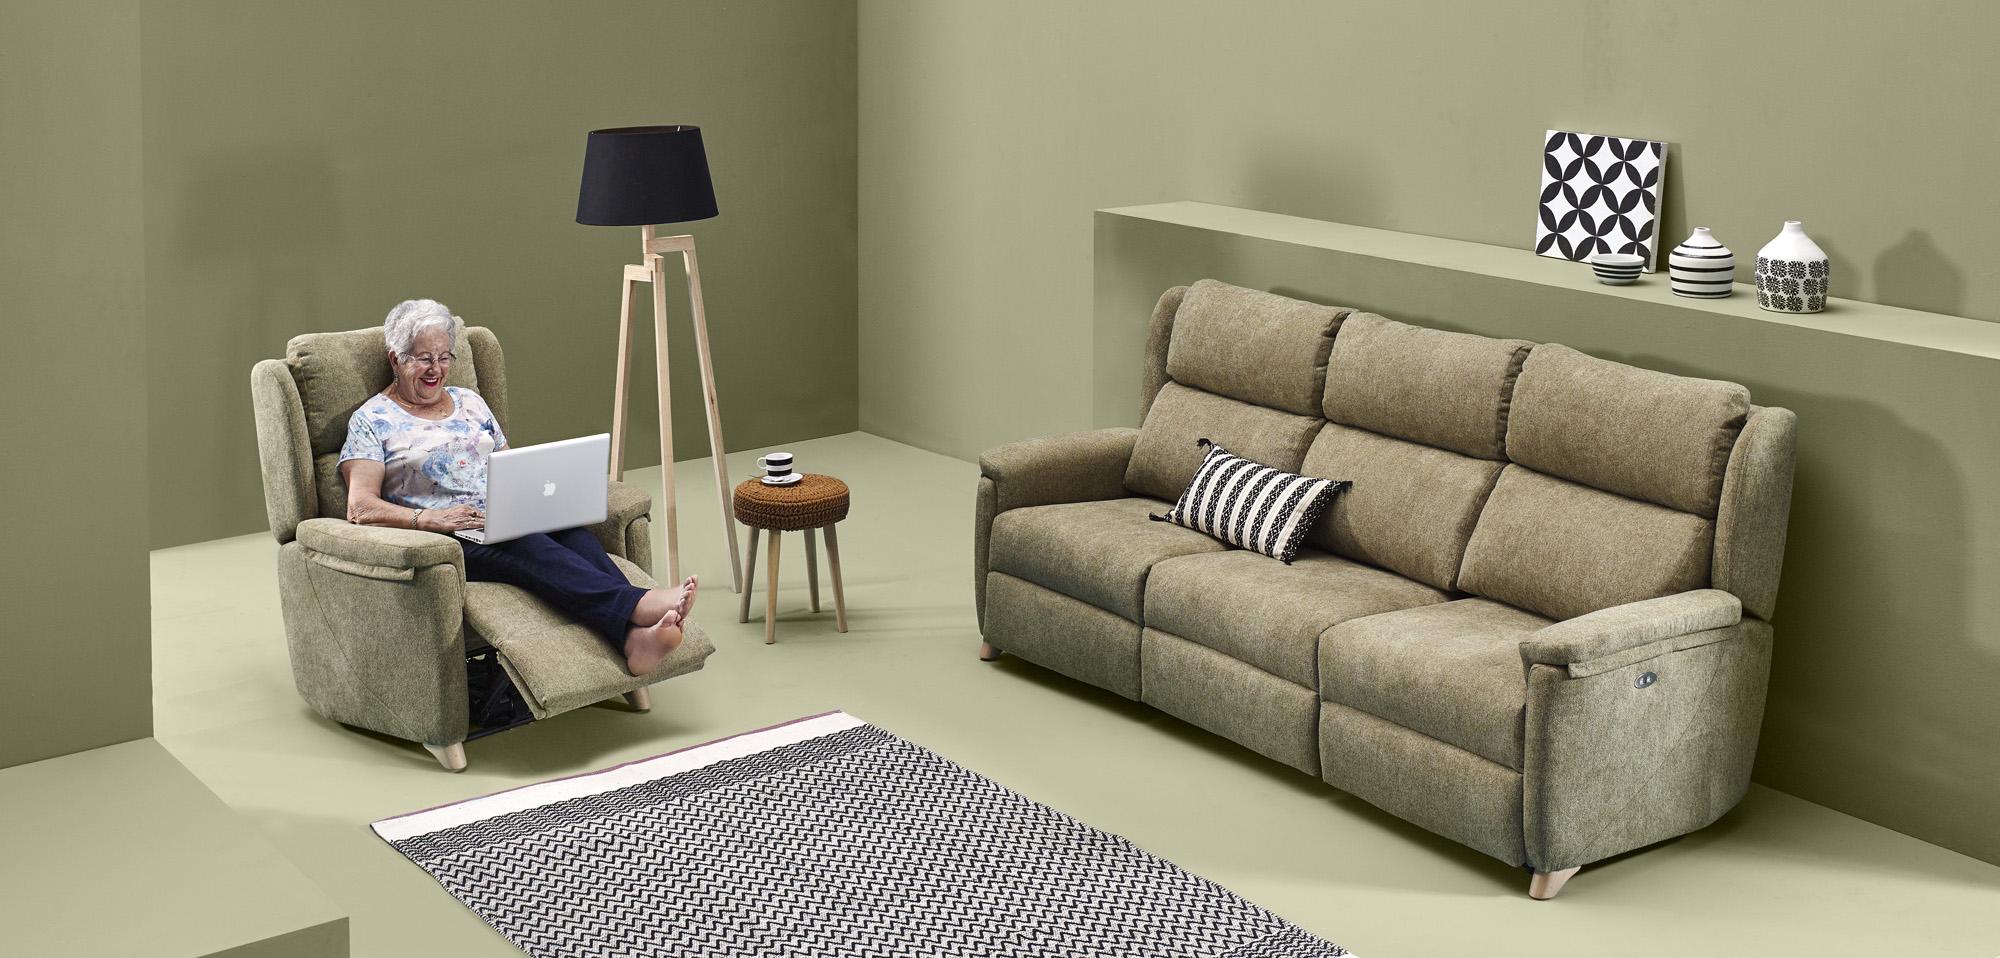 DIVERSO sofá modular relax motorizado by Reyes Ordoñez 3 PLAZAS RELAX venta en MUEBLES ANTOÑÁN León